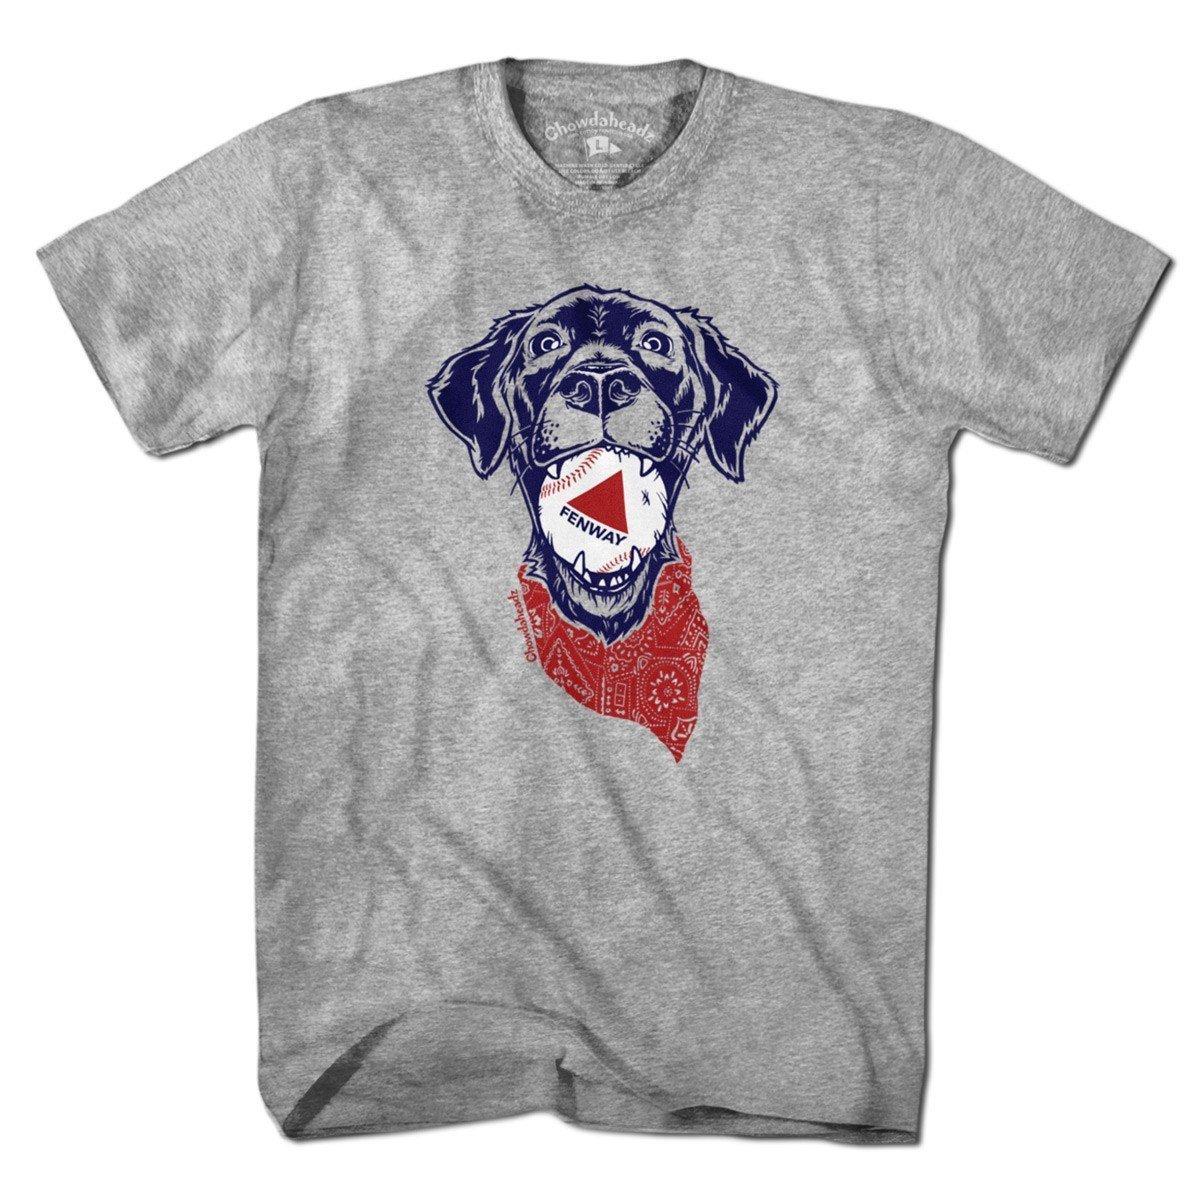 【当店一番人気】 Fenway犬Tシャツby Chowdaheadz Chowdaheadz M M B01N21URVT グレー B01N21URVT, 吉永町:7118f867 --- a0267596.xsph.ru